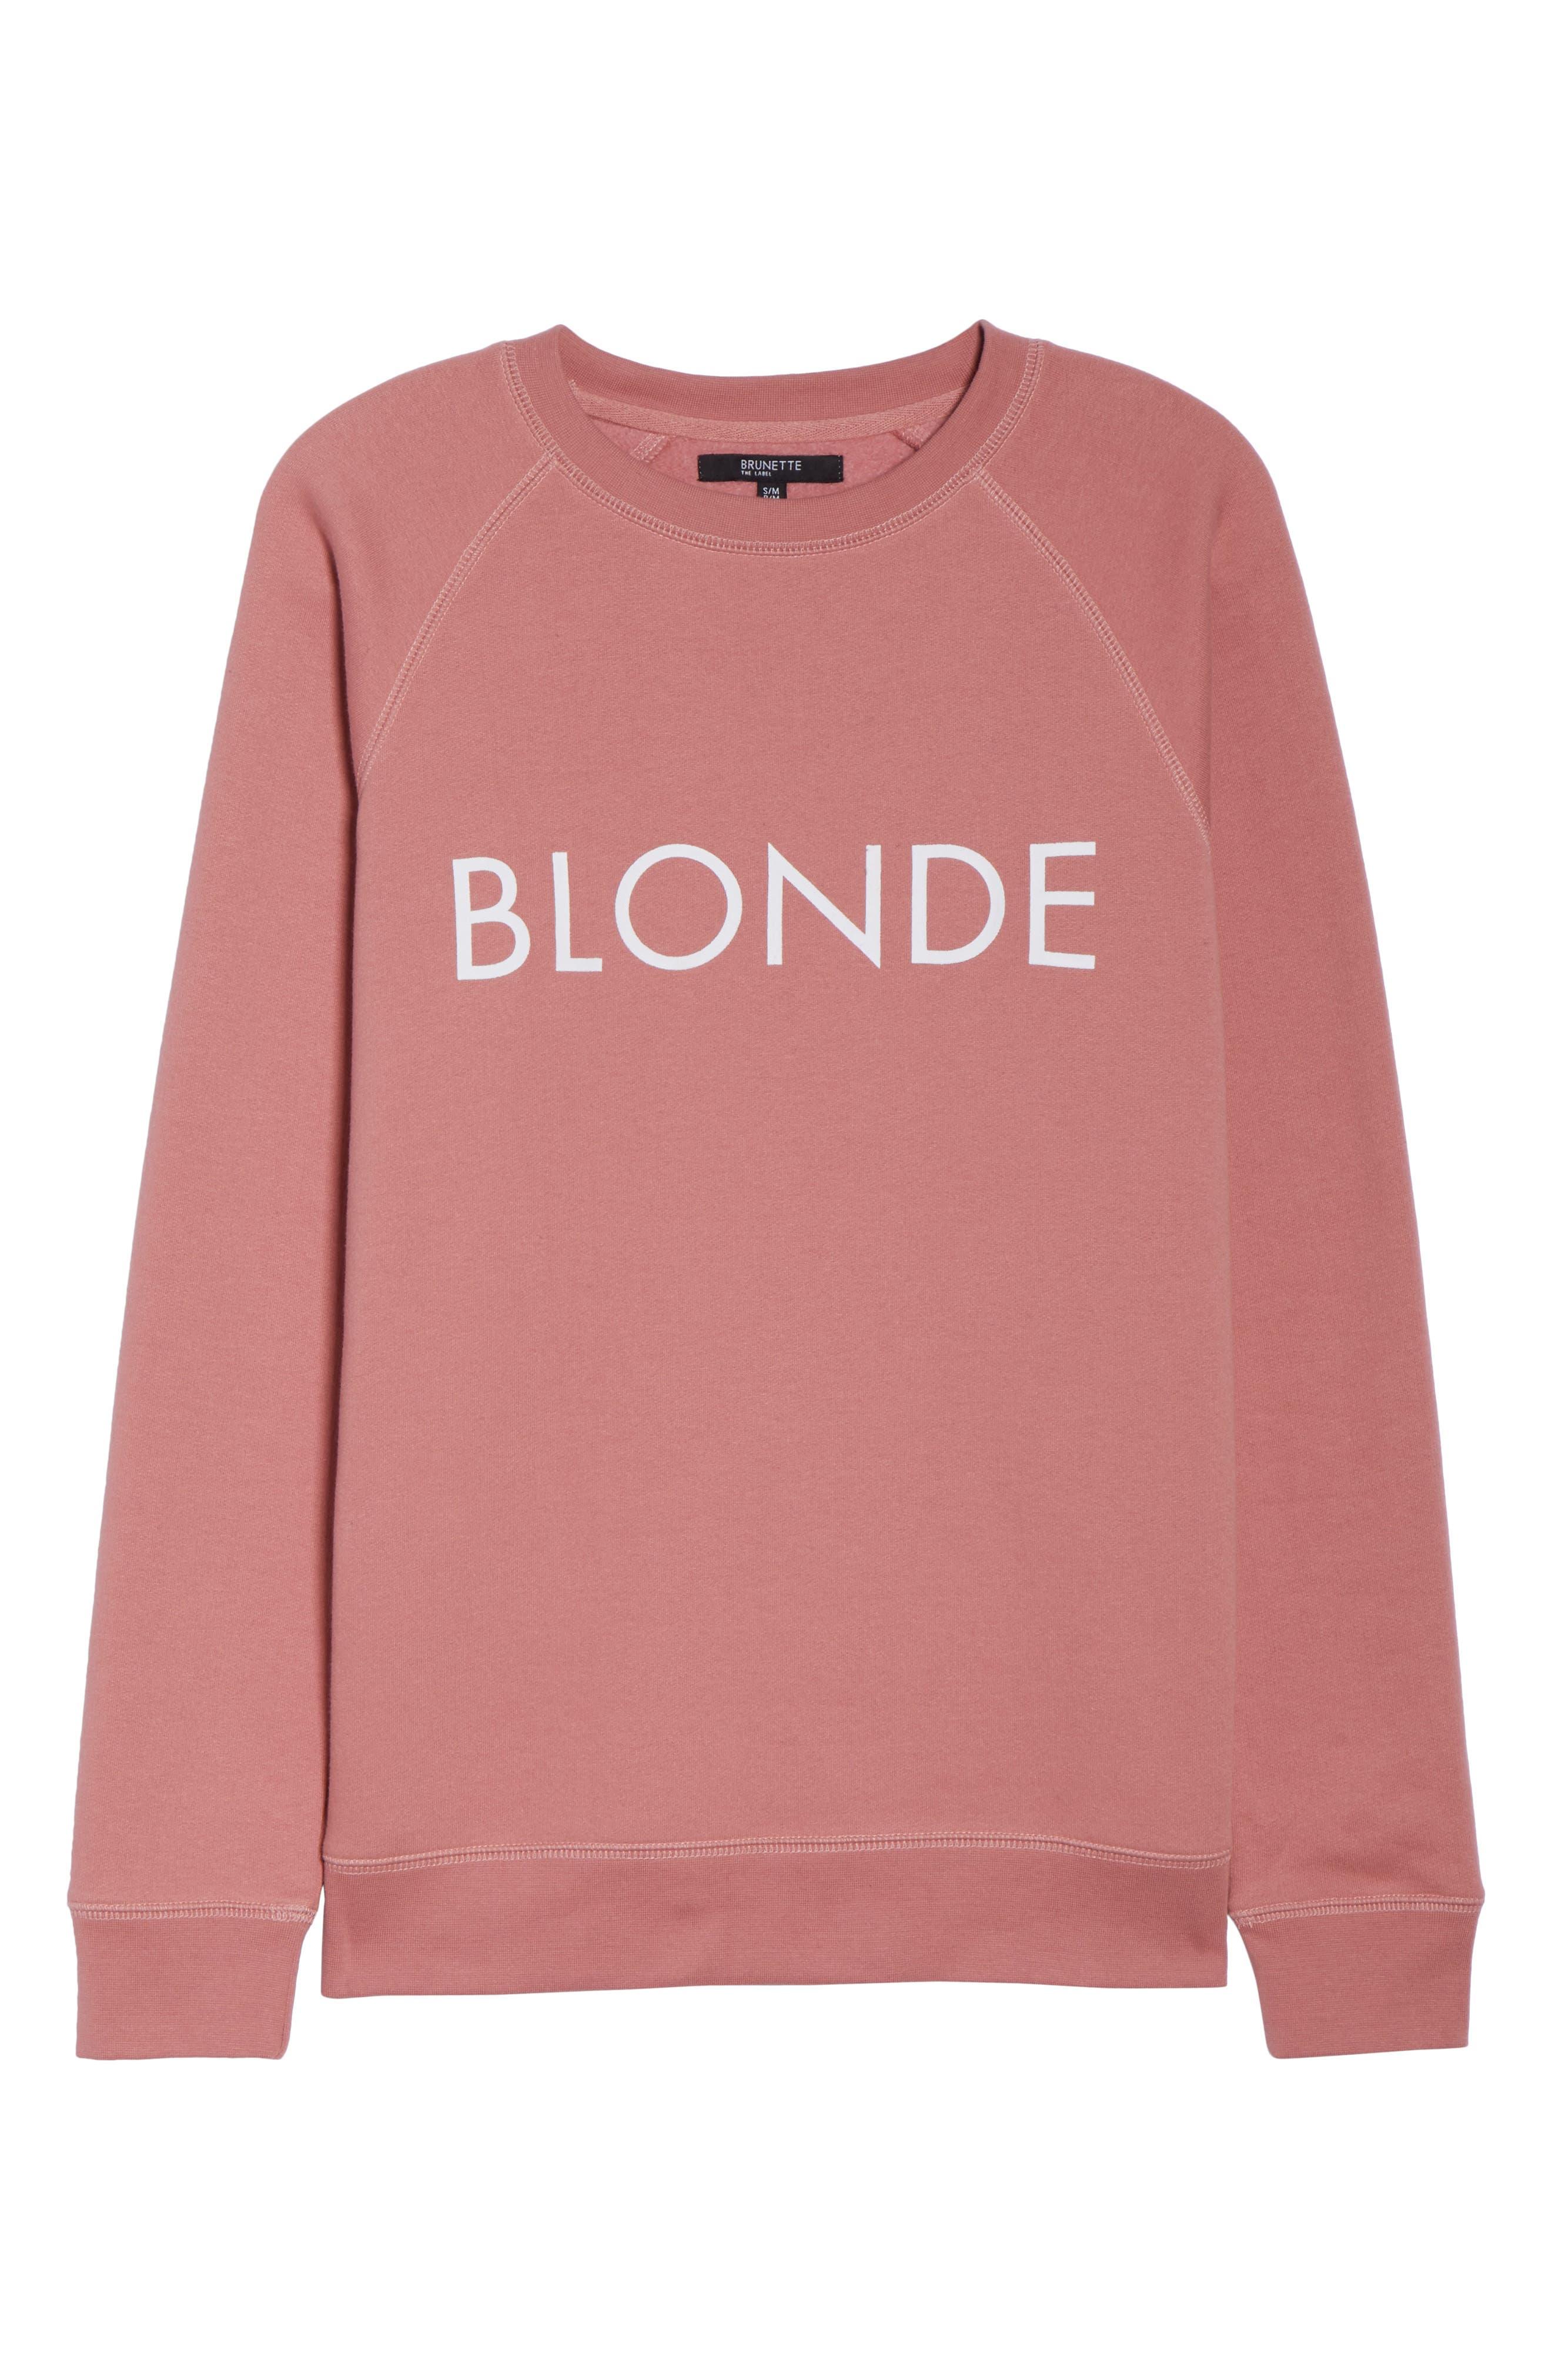 Blonde Crewneck Sweatshirt,                             Alternate thumbnail 6, color,